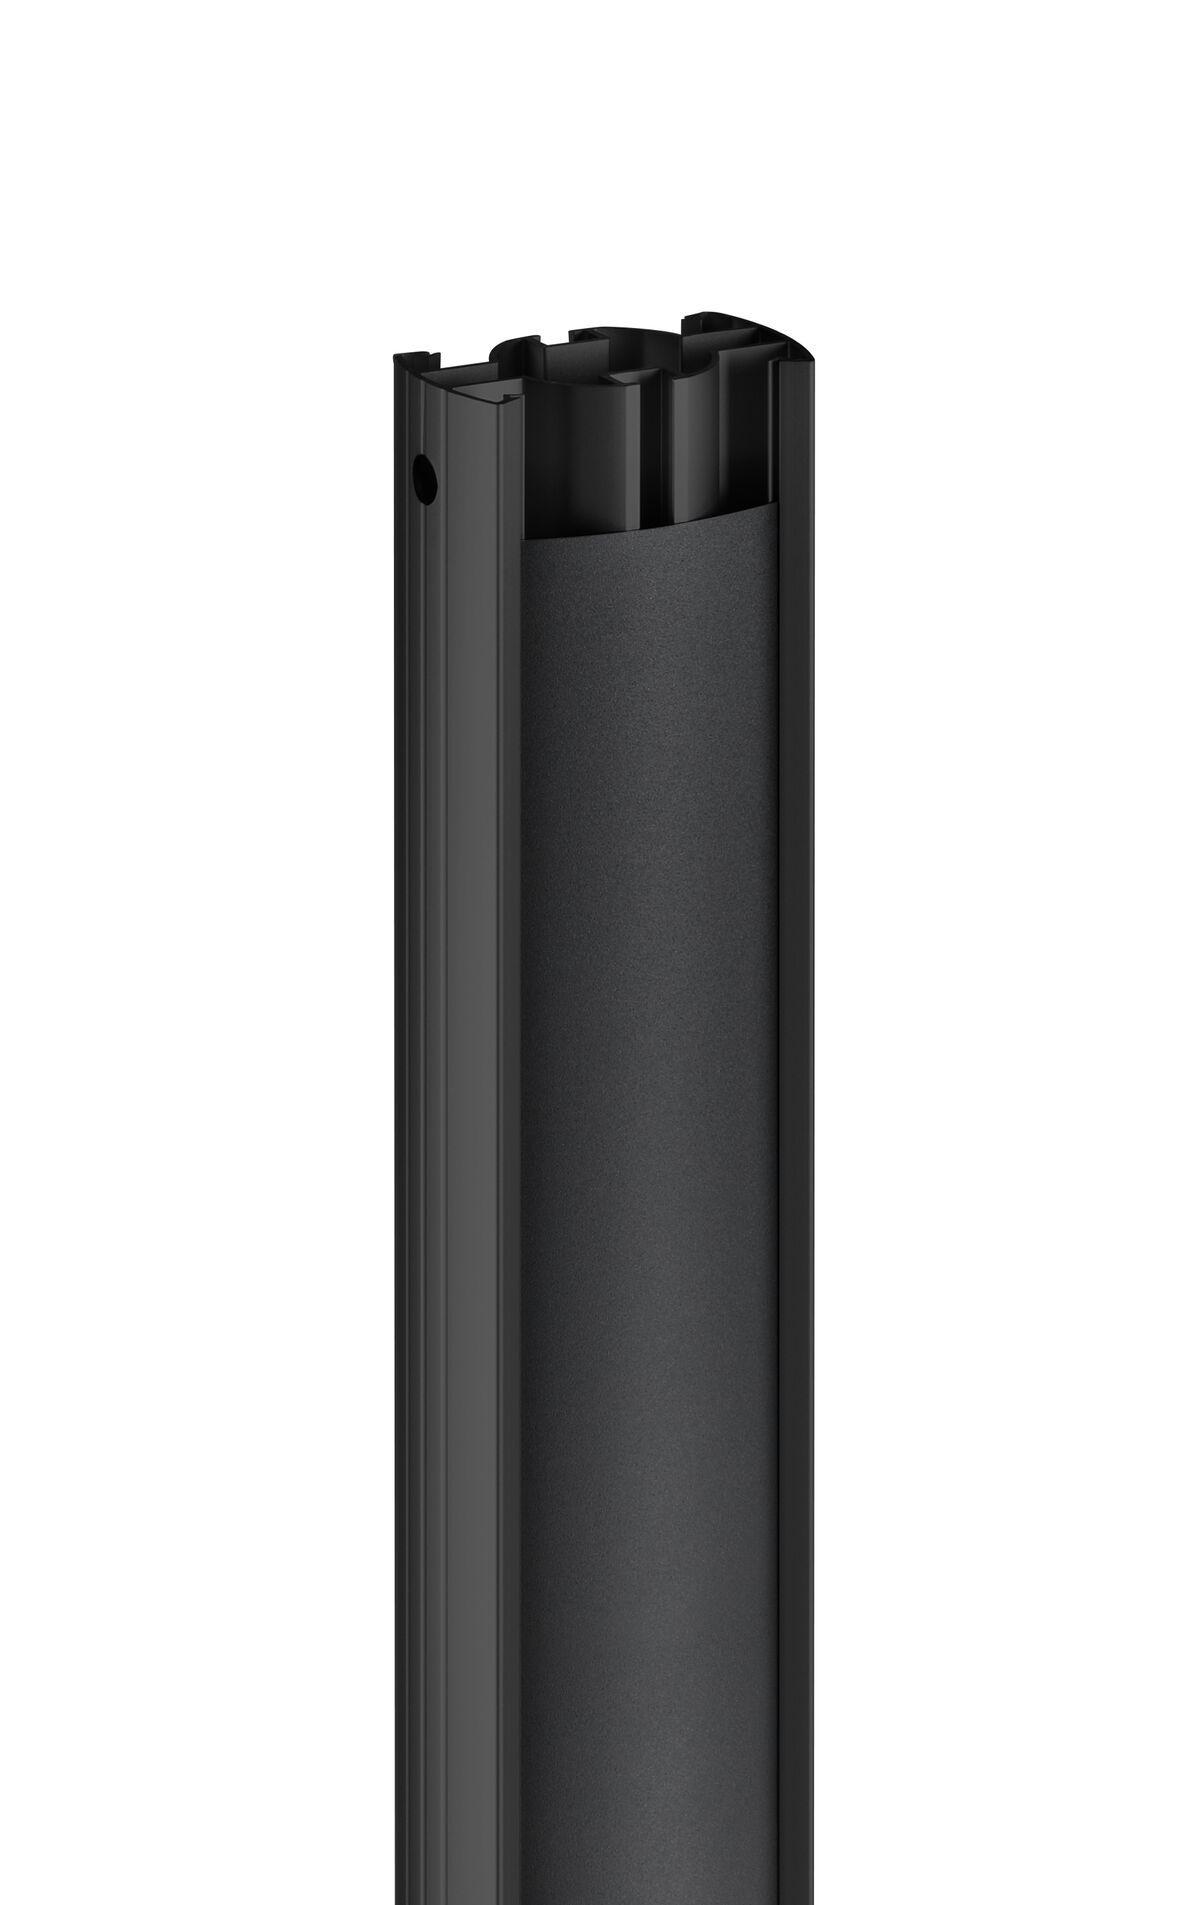 Vogel's PUC 2530 Штанга 300 cm, черная - Product